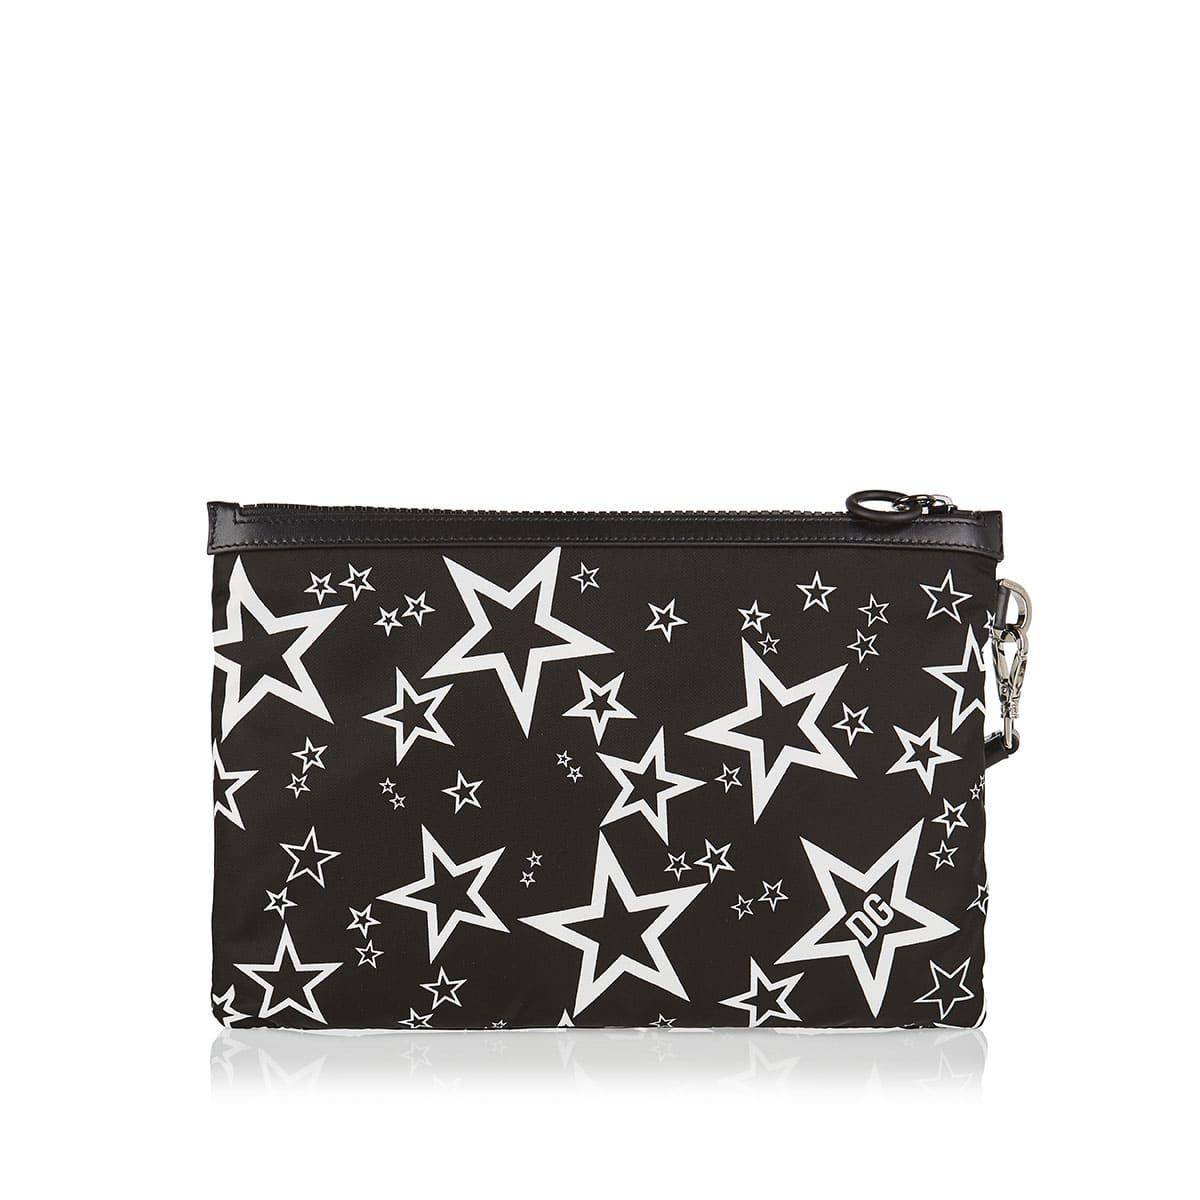 Millennials Star printed pouch